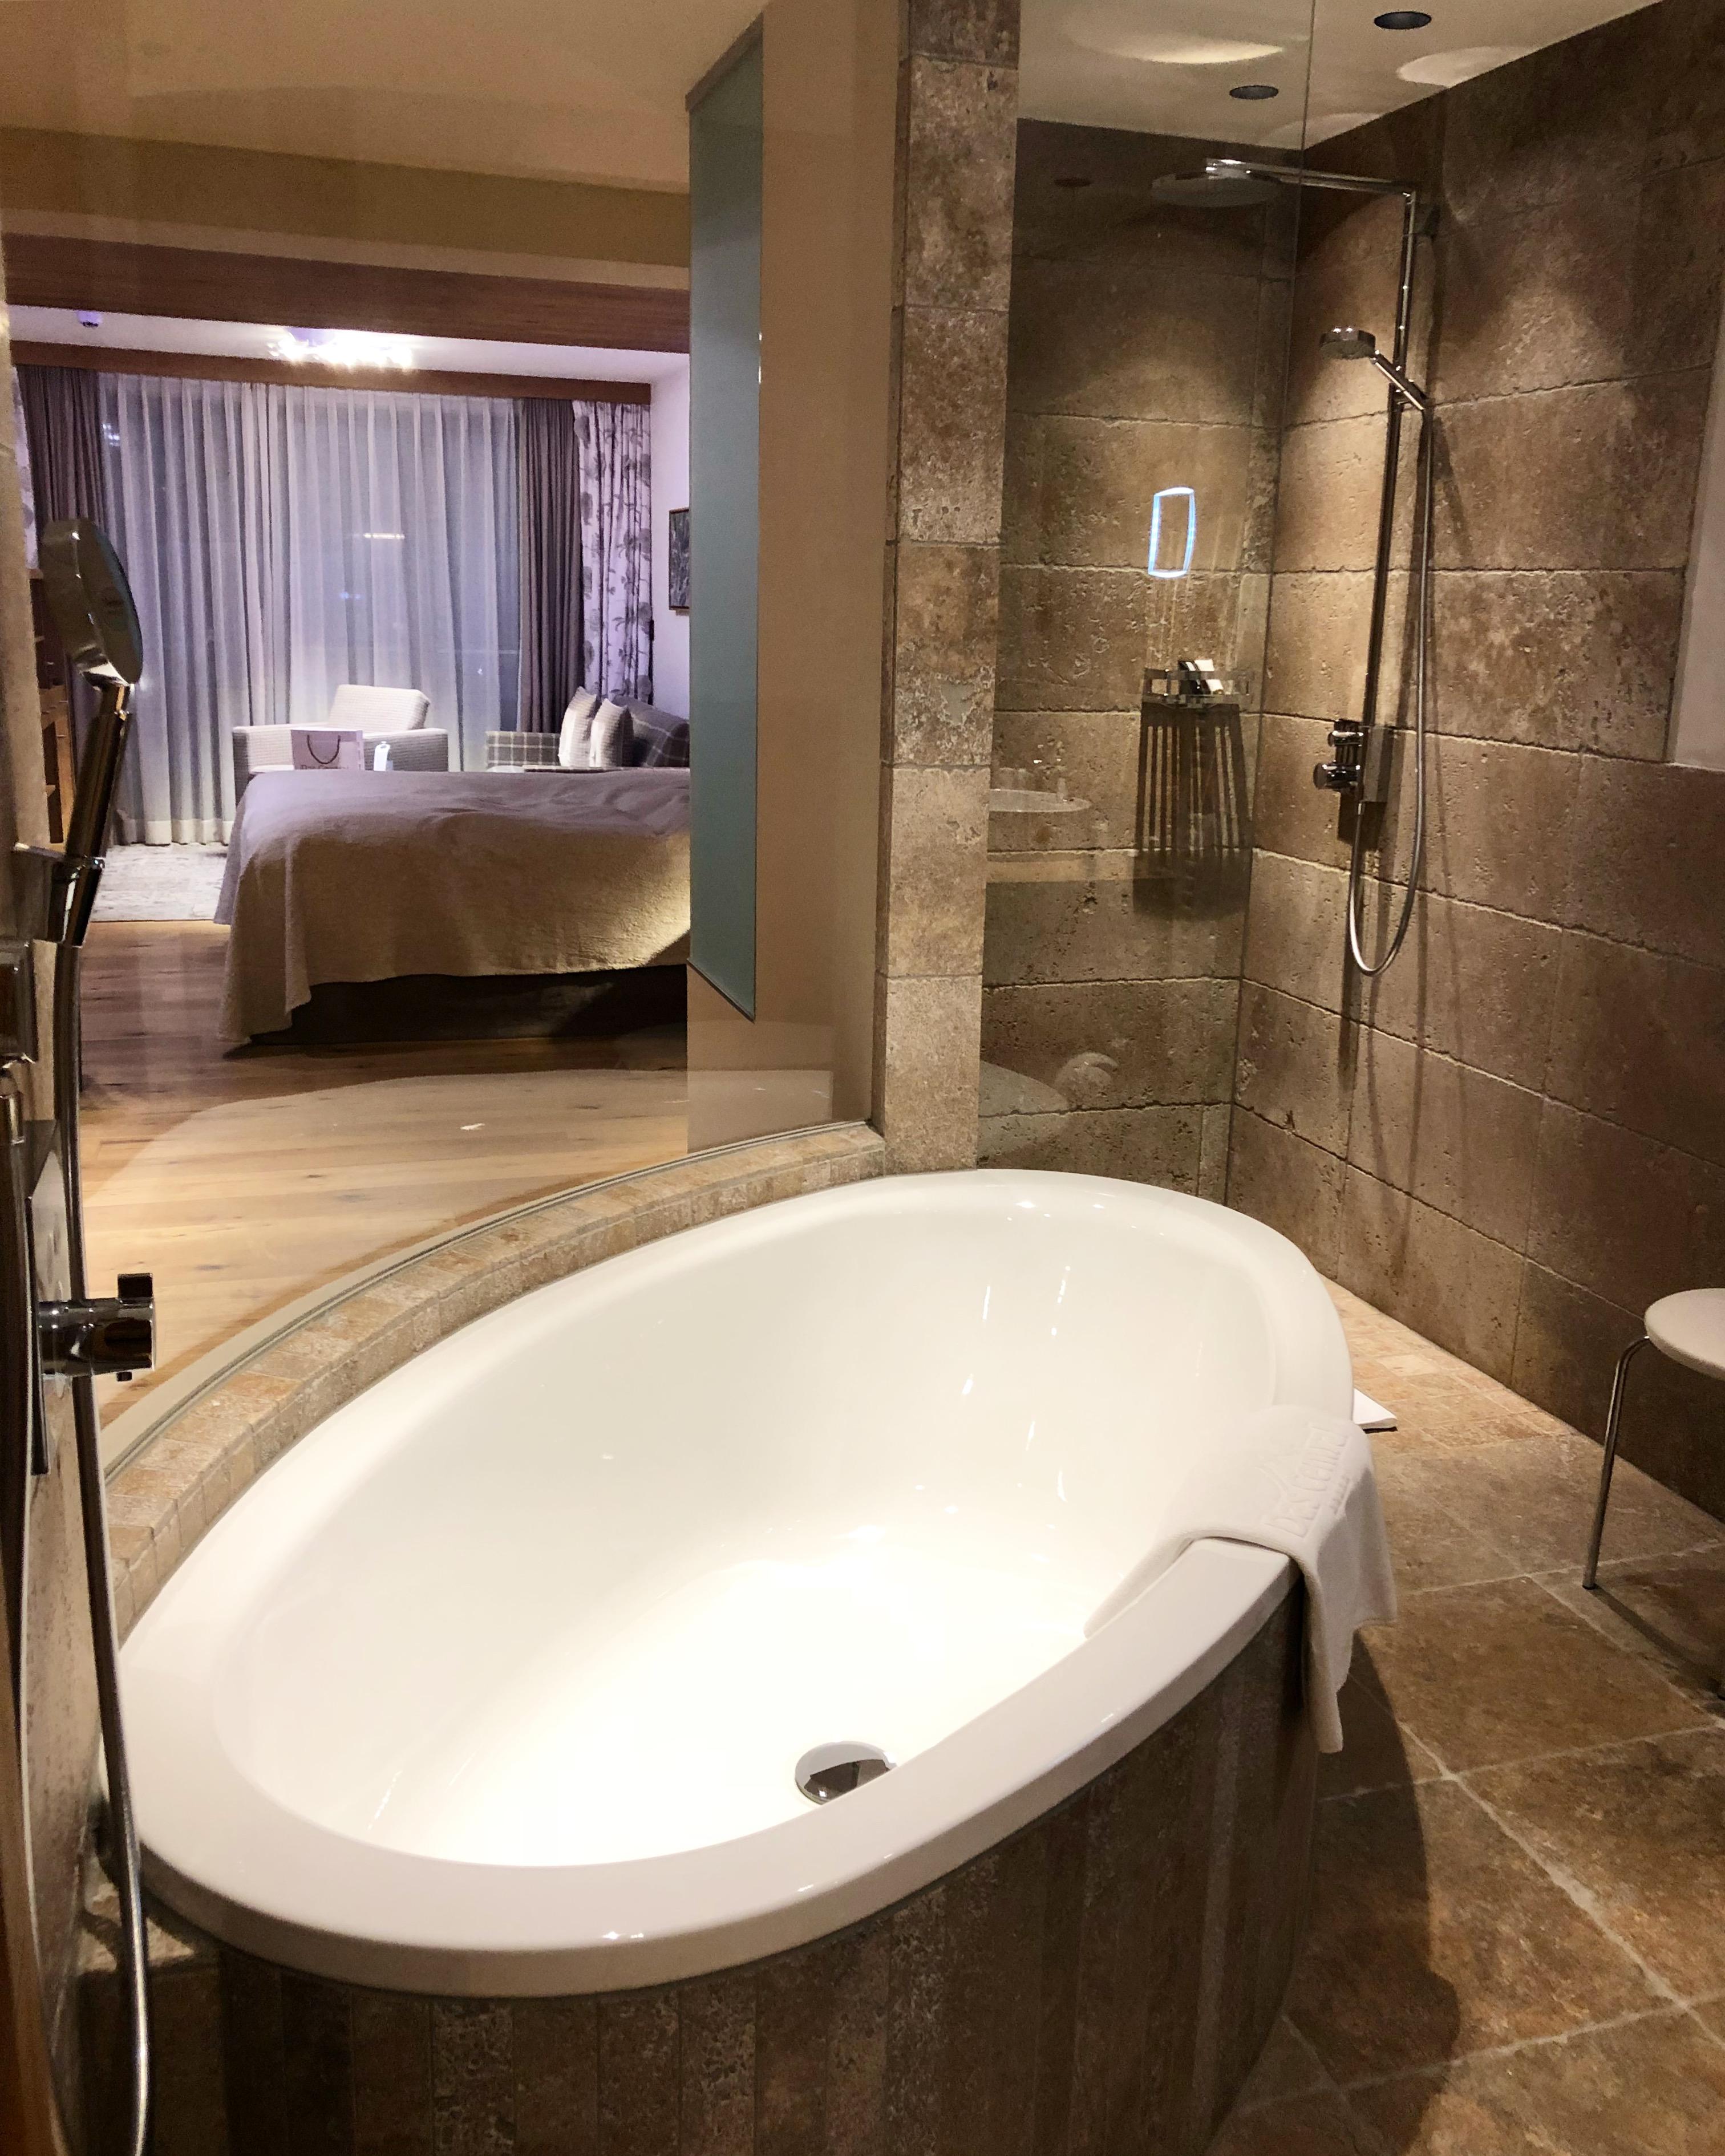 5 Sterne Hotel Tirol